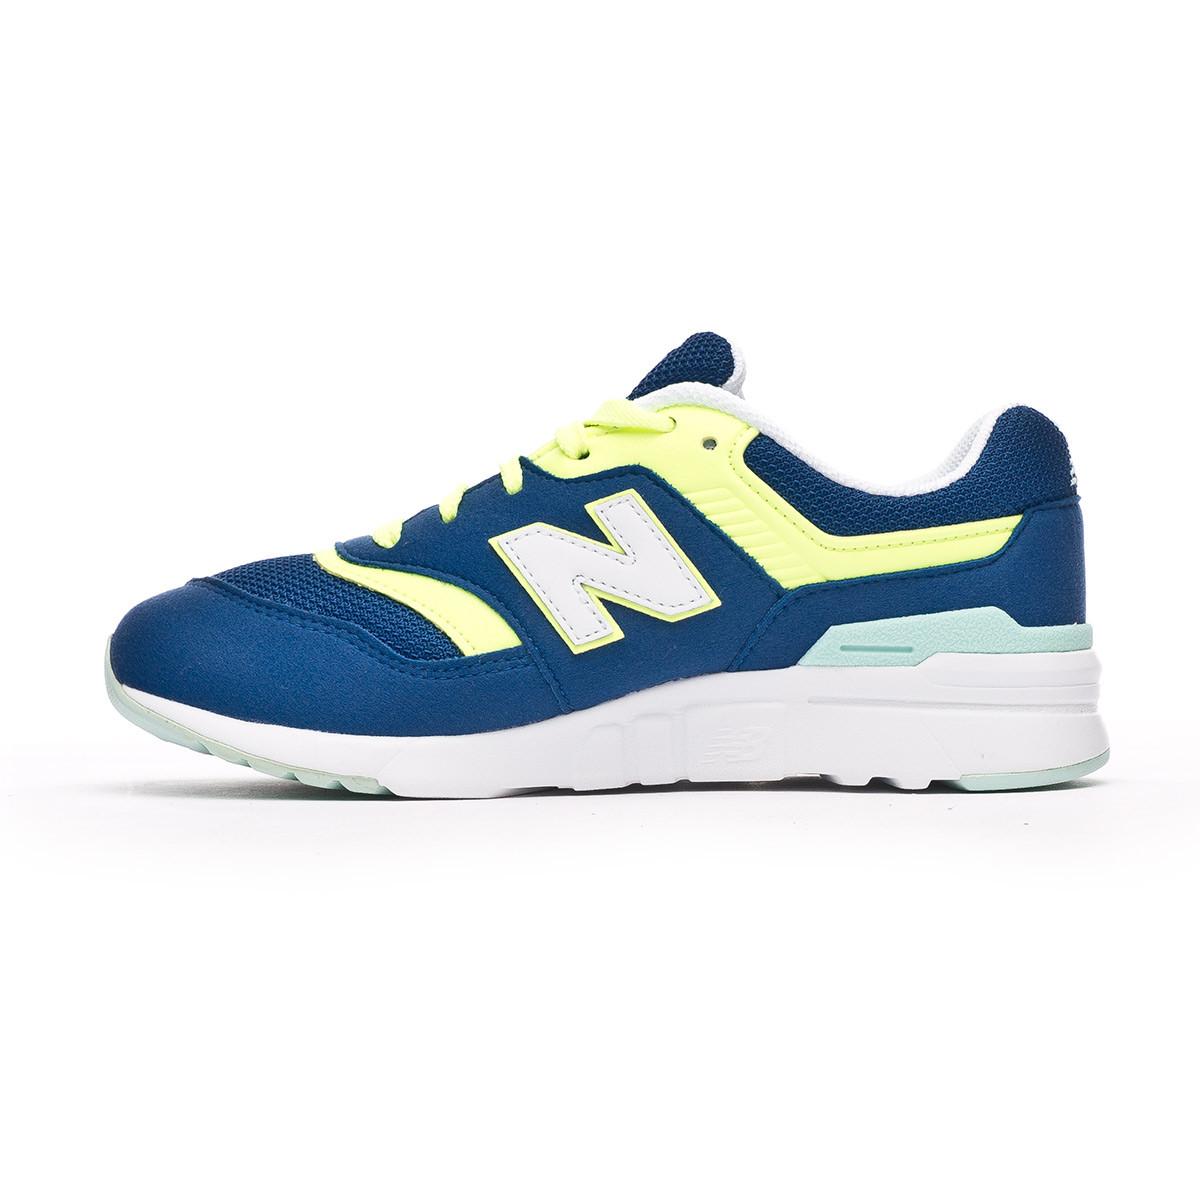 chaussure new balance 997h enfant